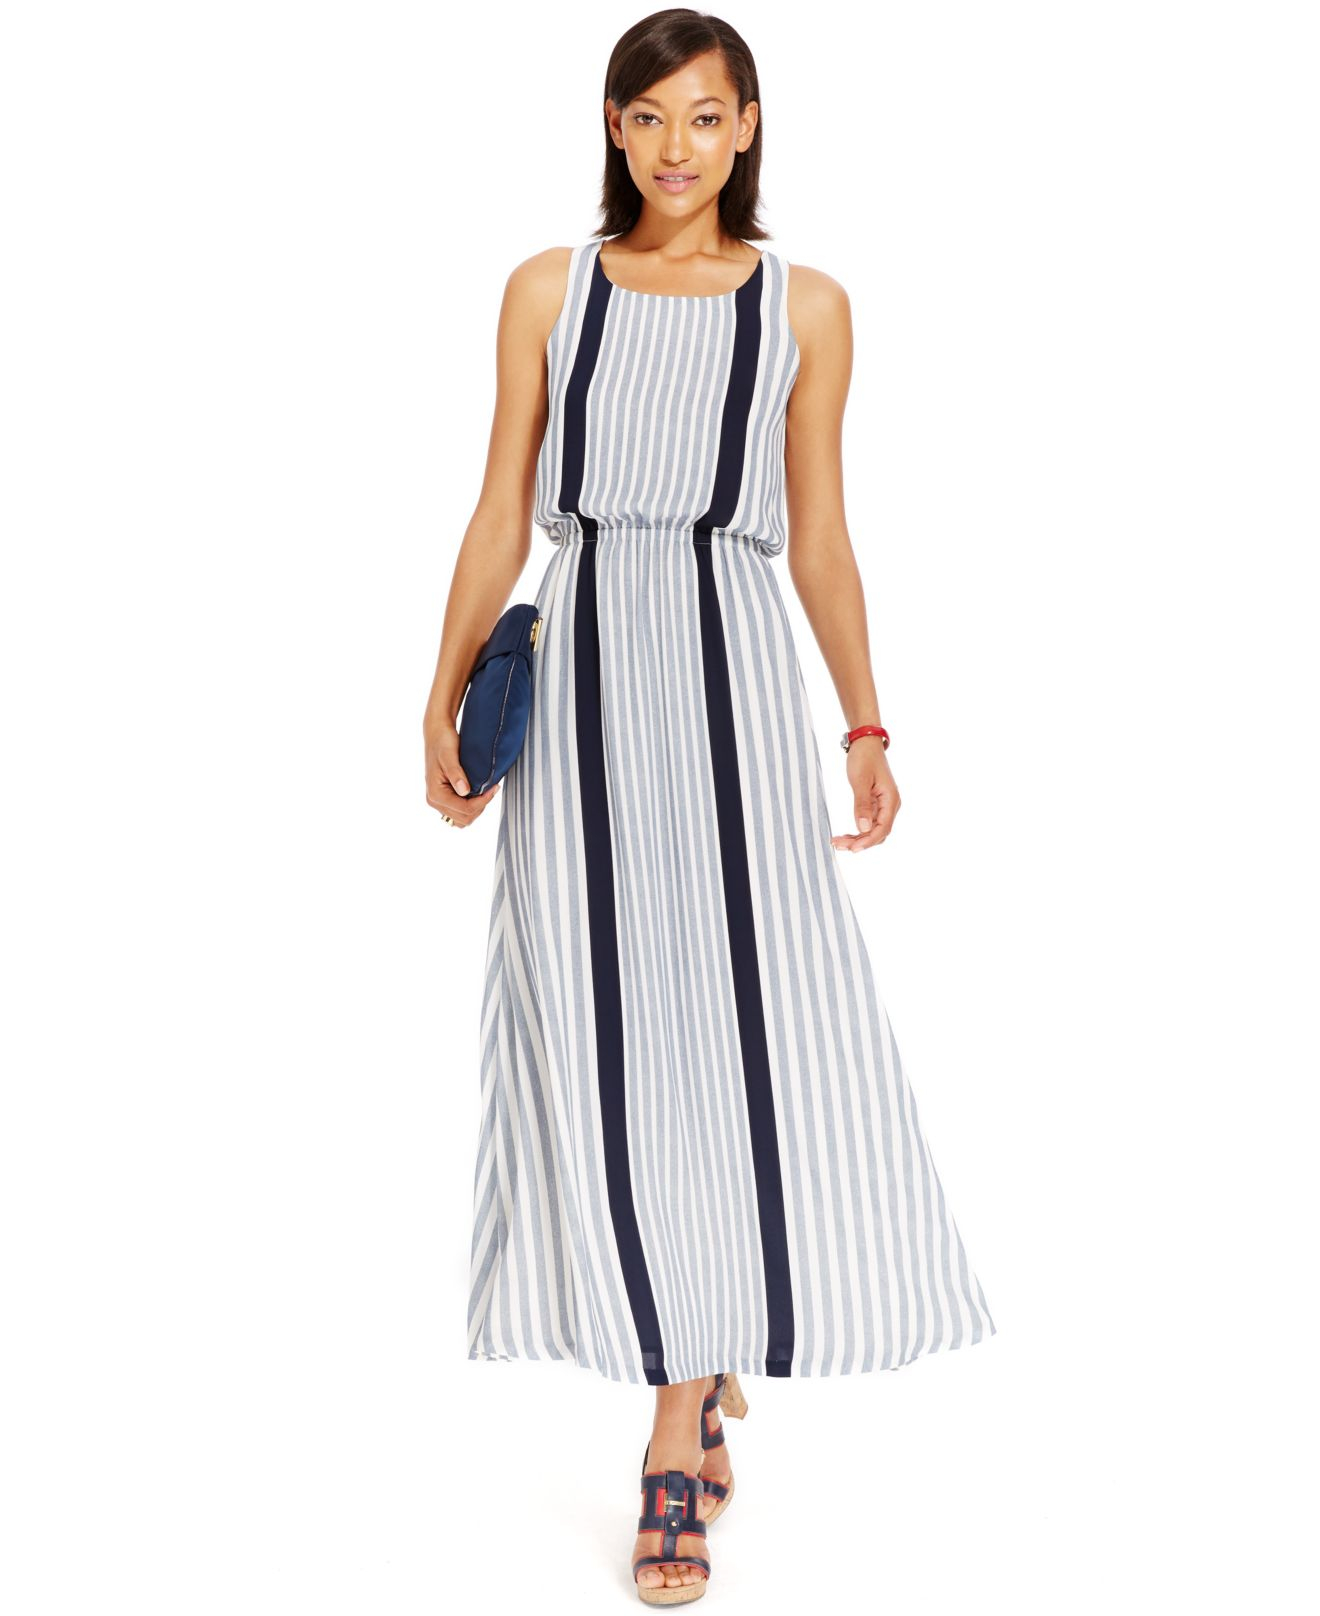 Lyst - Tommy Hilfiger Striped A-Line Maxi Dress in Blue